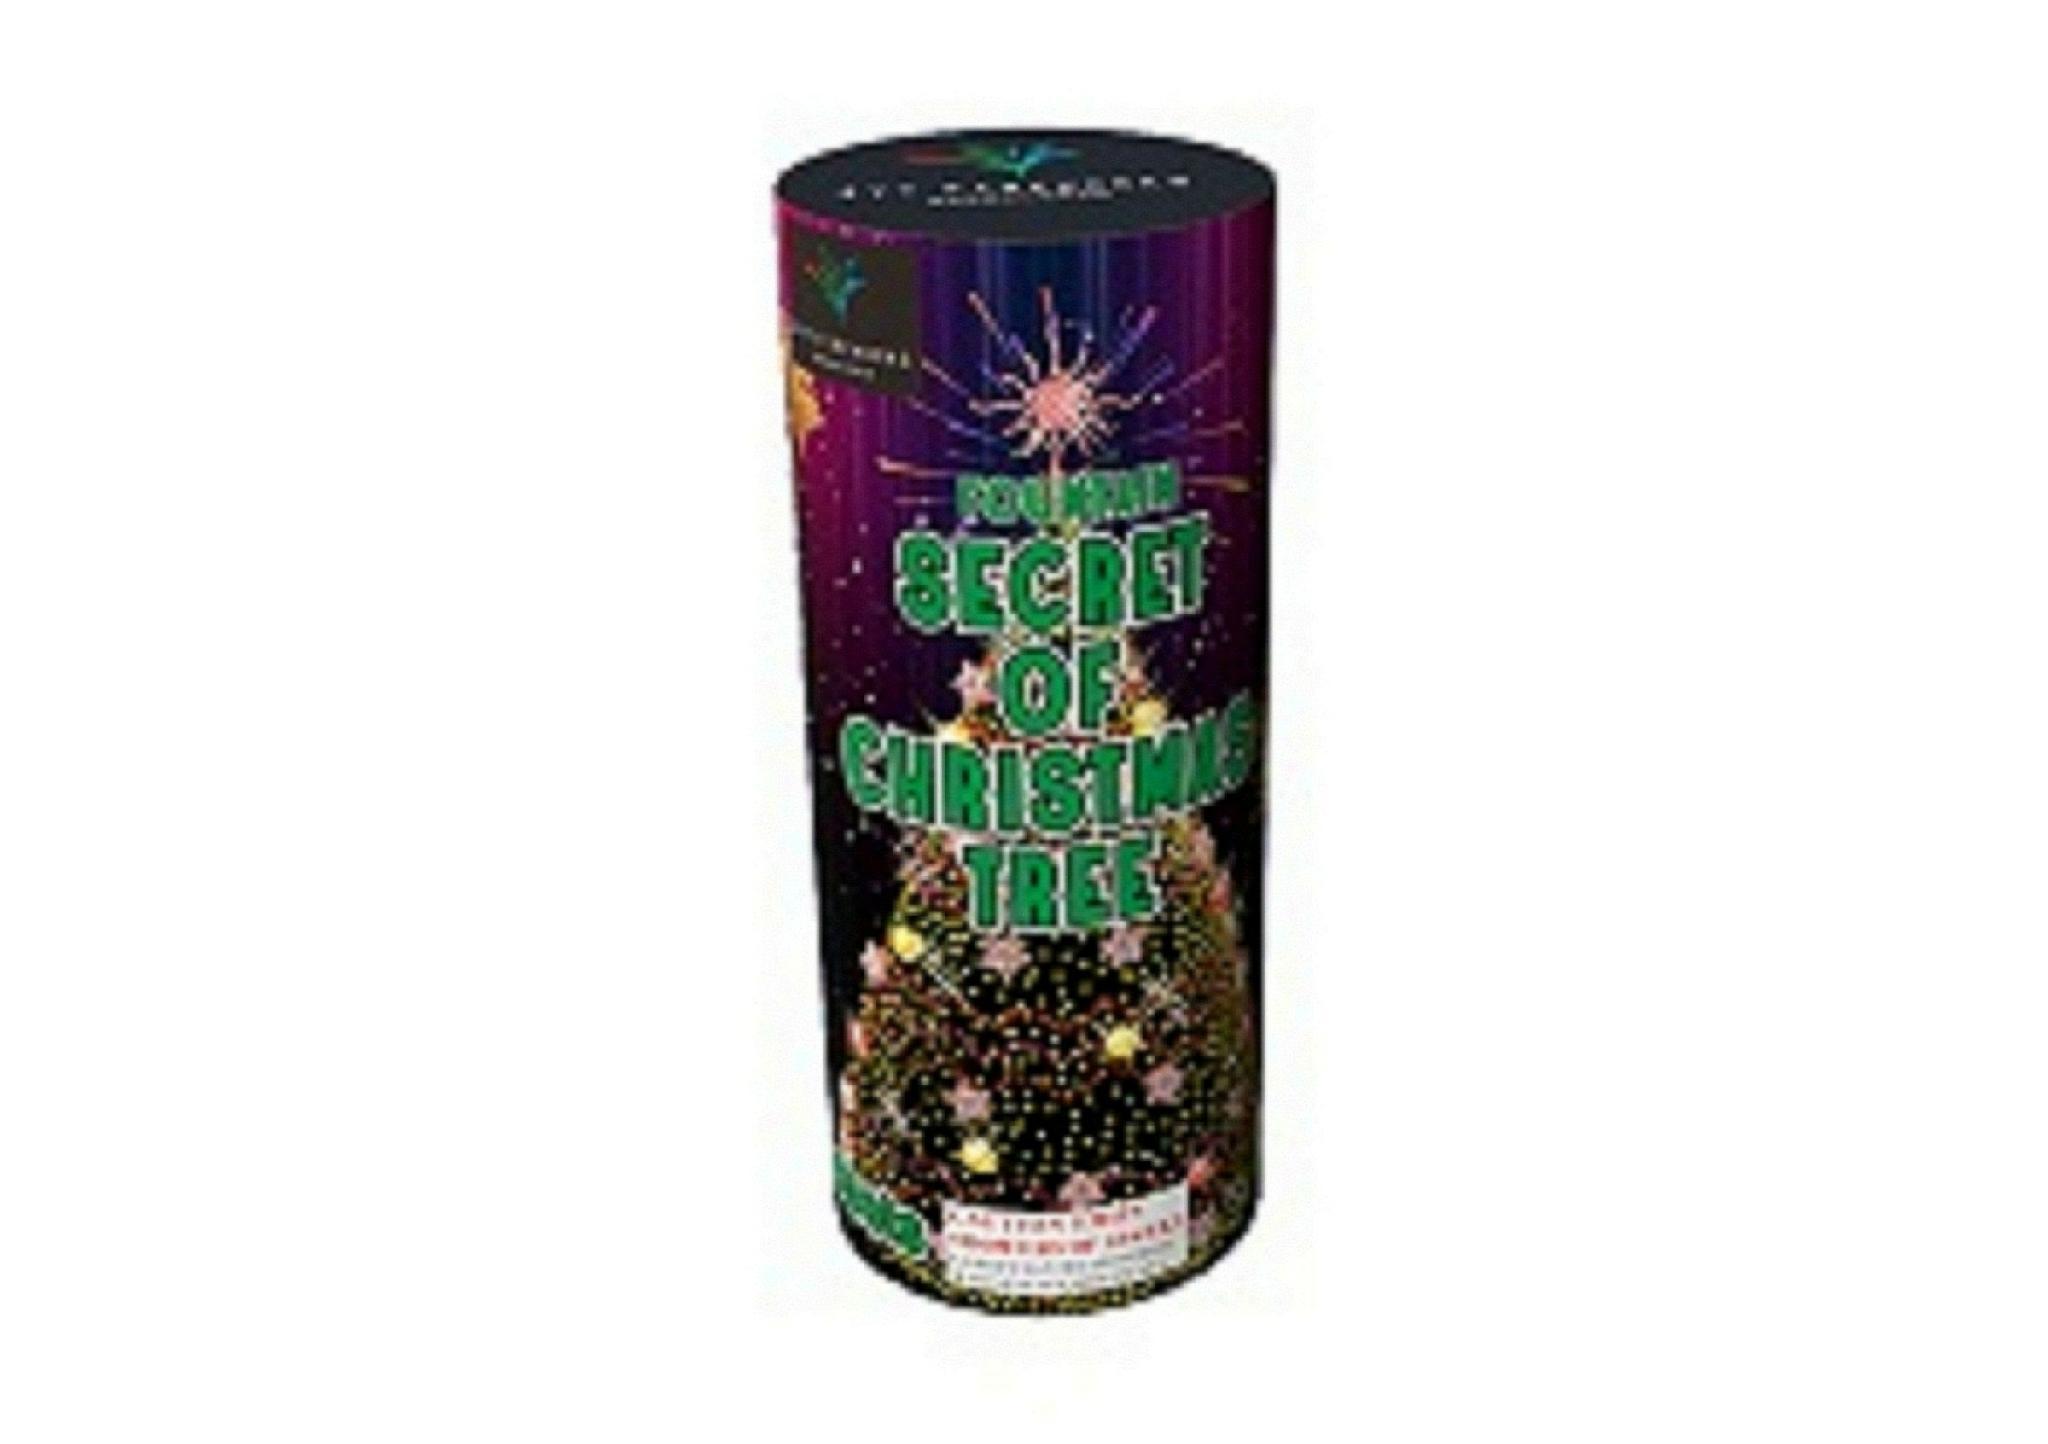 3shots Fountain (JYTA020077) Fireworks 1